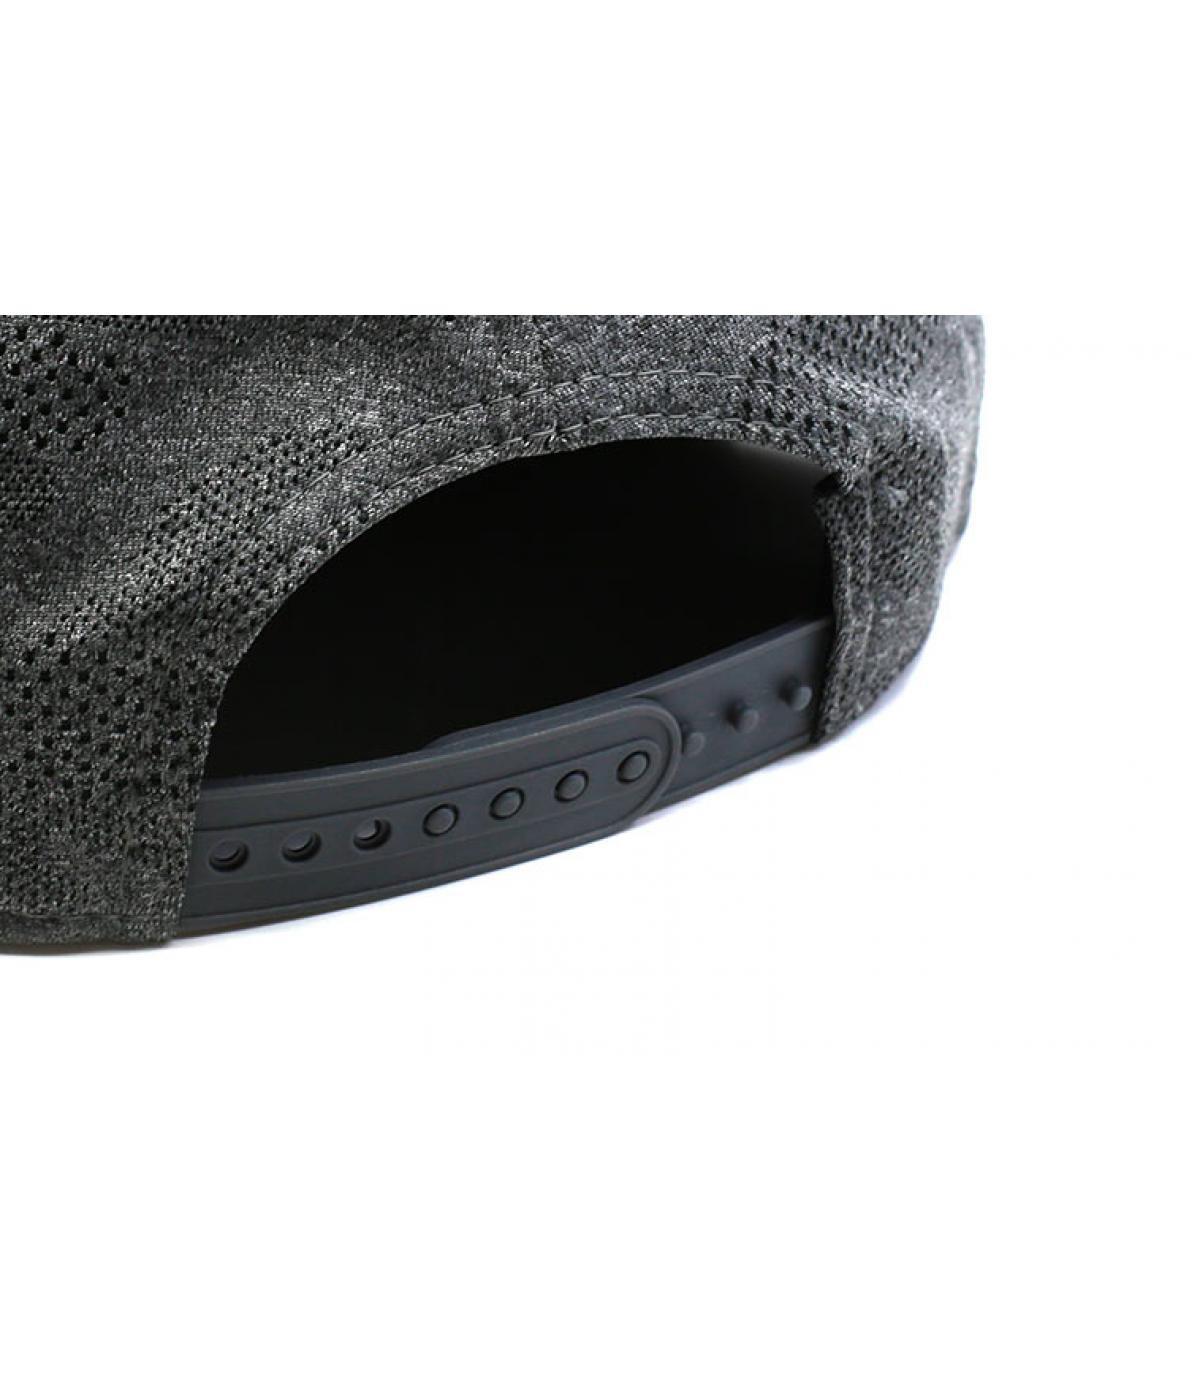 Detalles Engineered Plus Raiders 950 gray black imagen 5